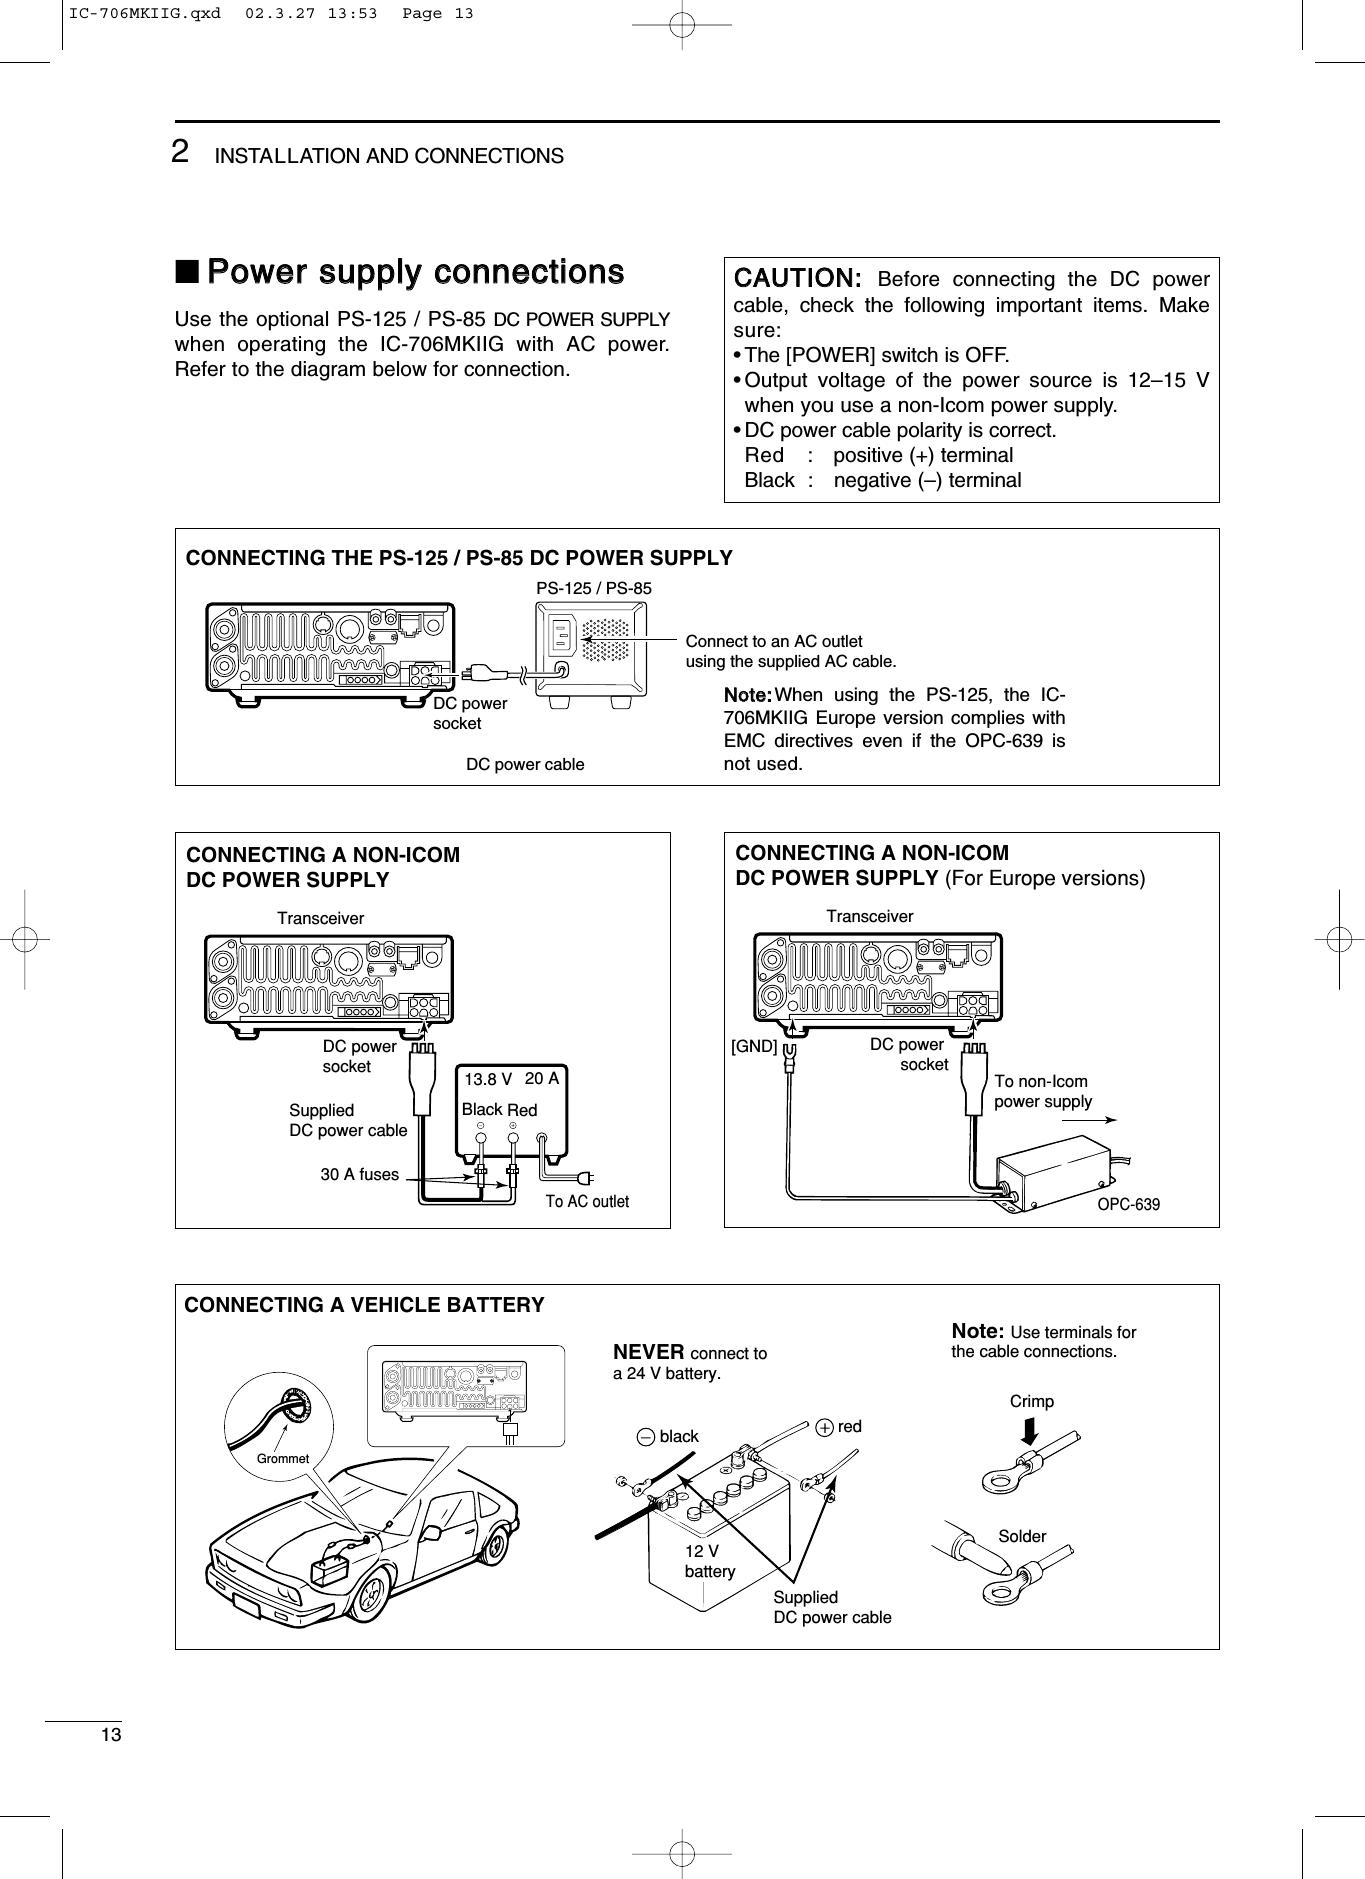 icom ic 2100h user manual